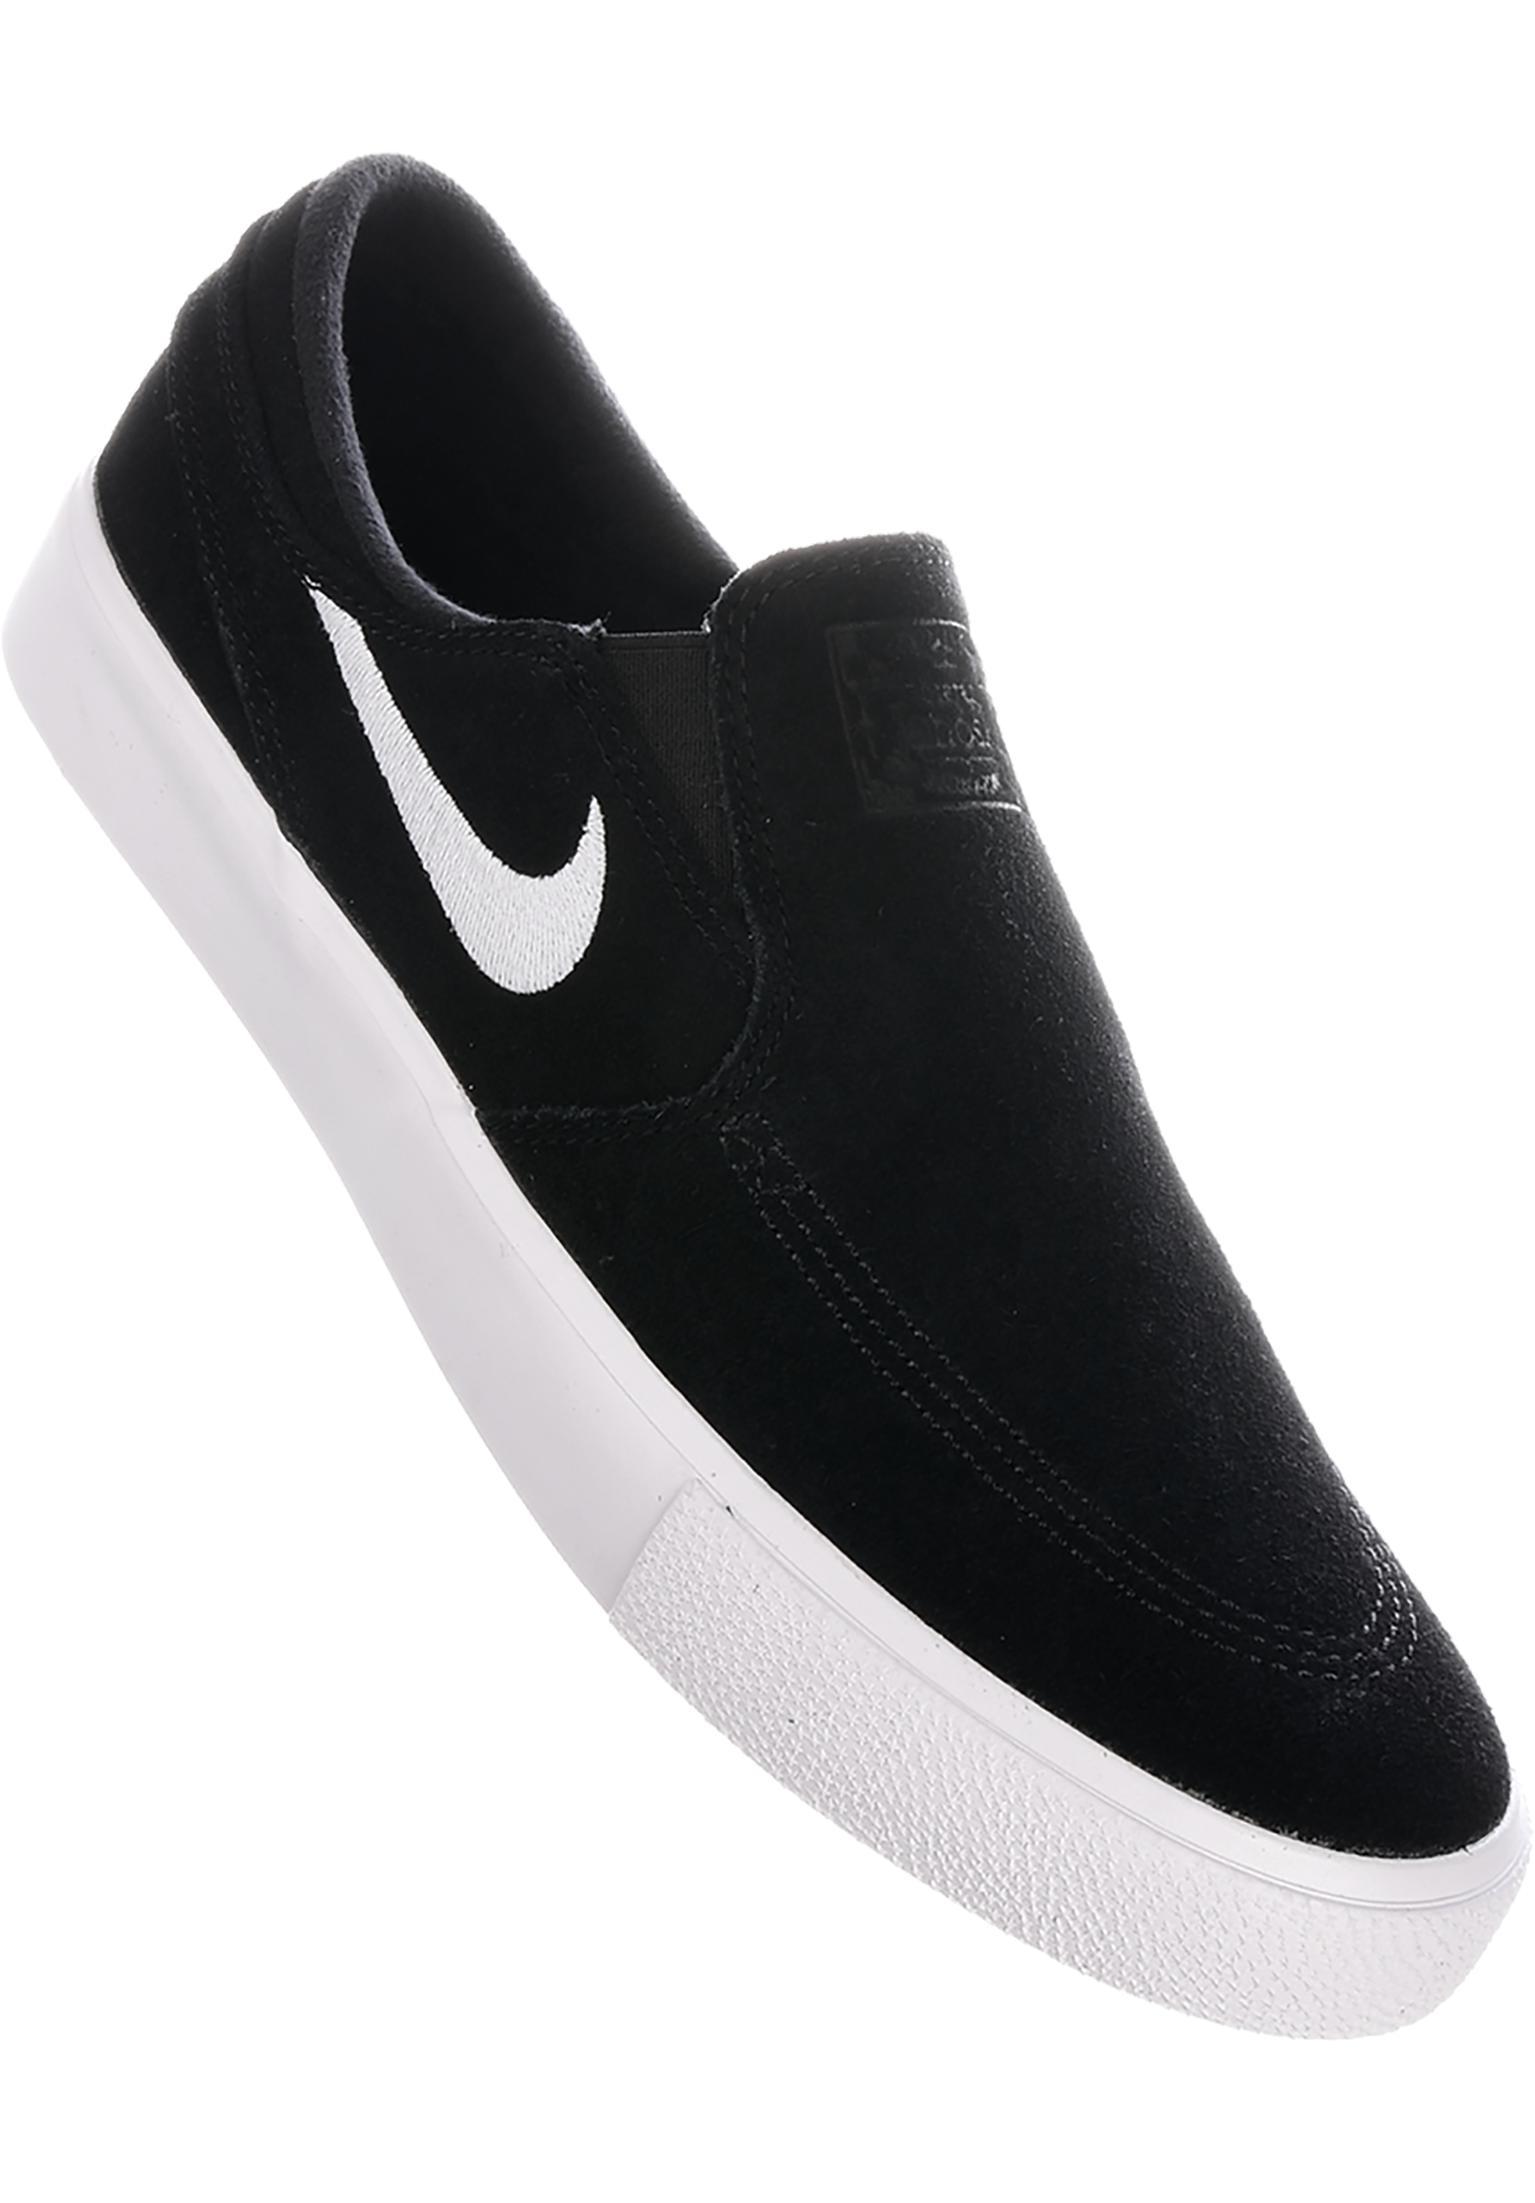 6df16ee46d Zoom Stefan Janoski Slip On RM Nike SB All Shoes in black-white for Men    Titus